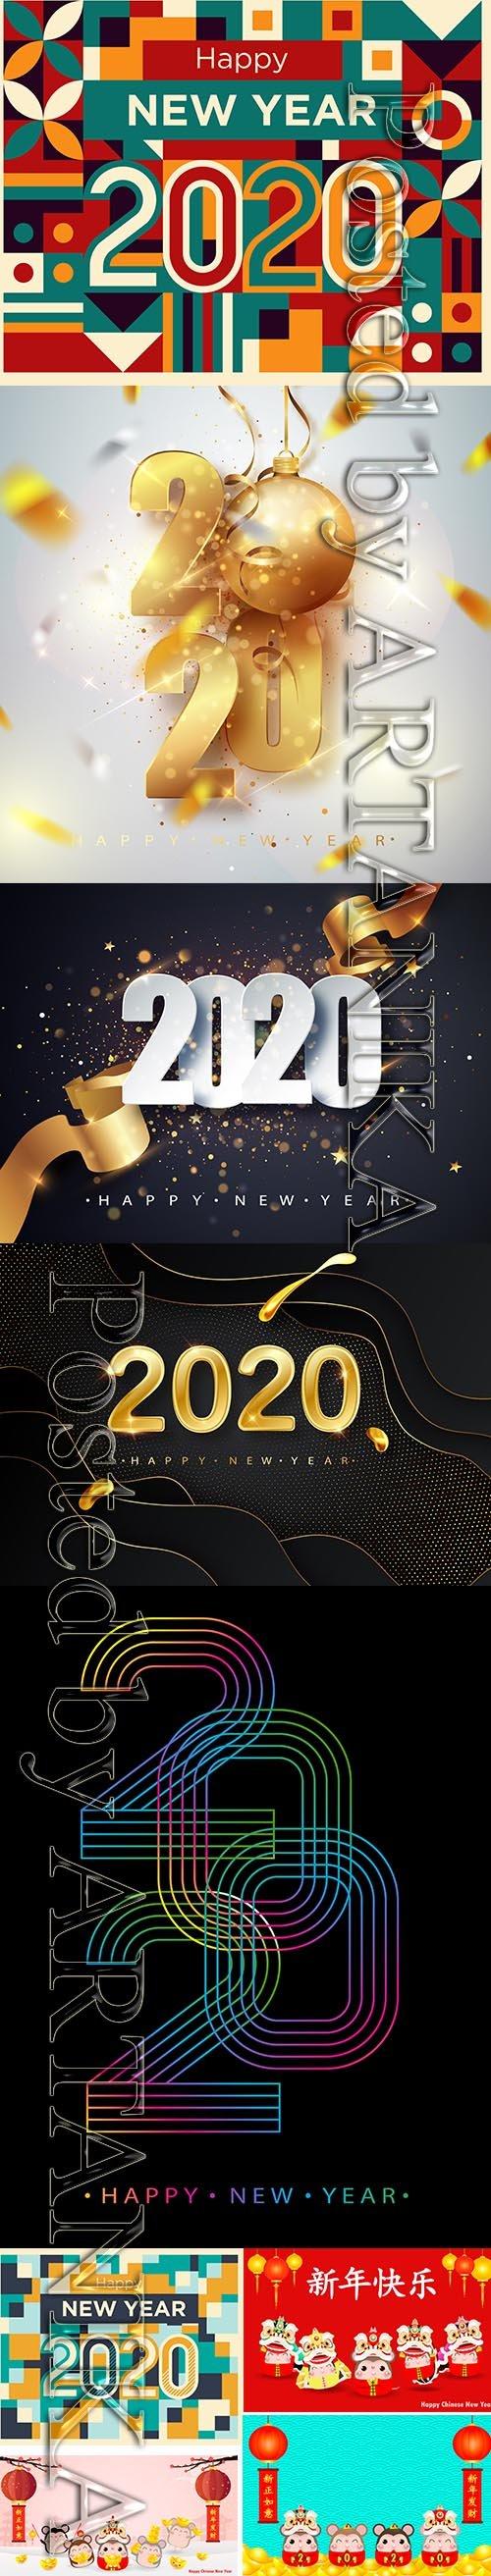 Vector Set - New Year 2020 Illustartions Pack Vol 4